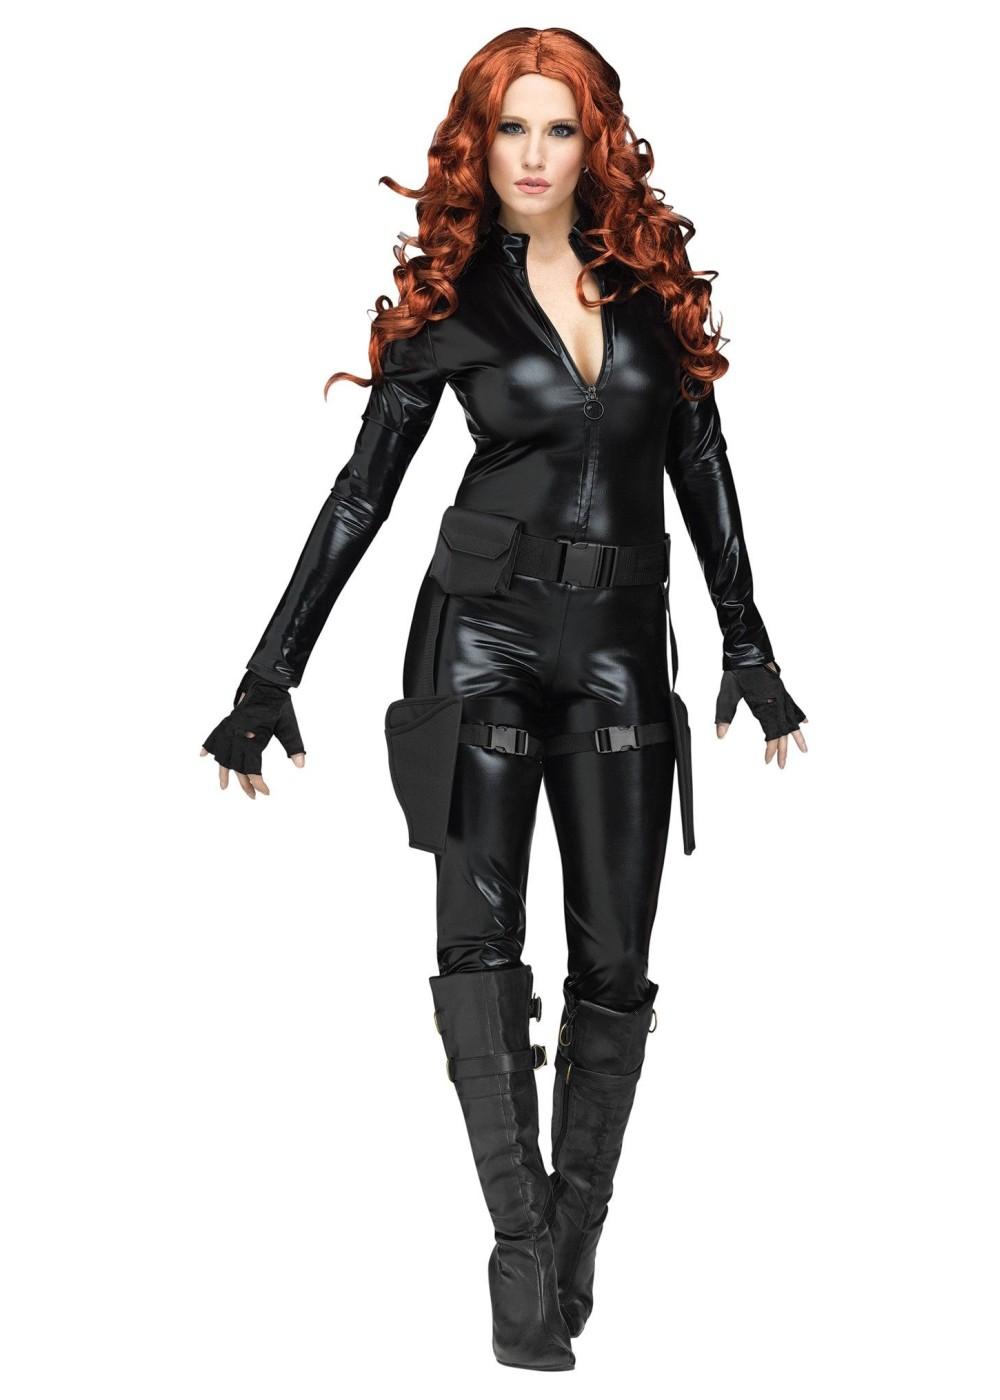 midnight operation women costume superhero costumes. Black Bedroom Furniture Sets. Home Design Ideas